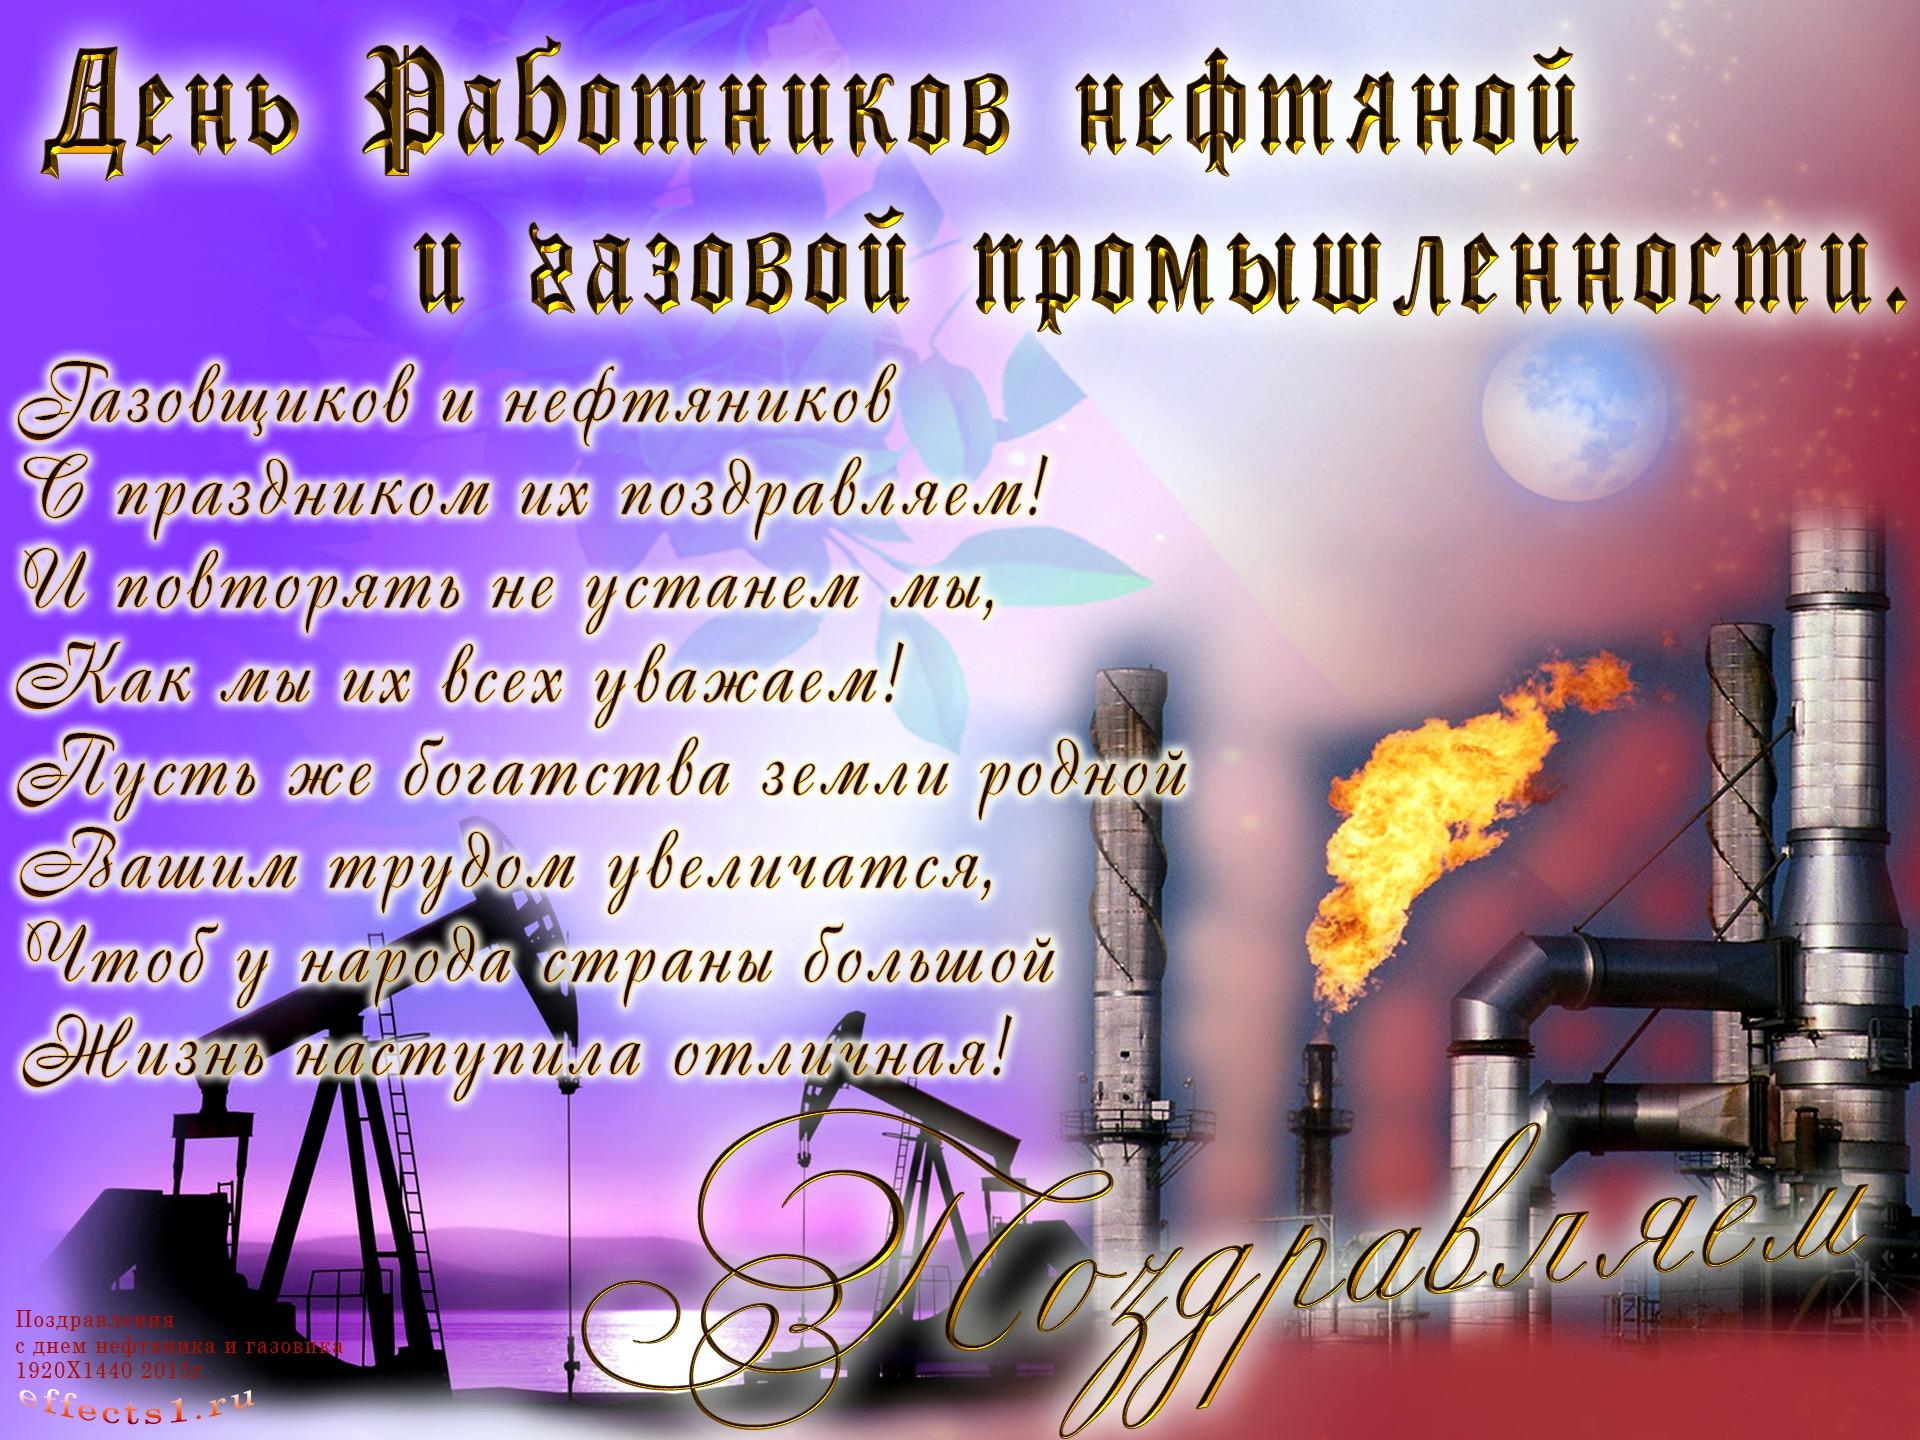 Тесты картинками, картинки к дню нефтяника